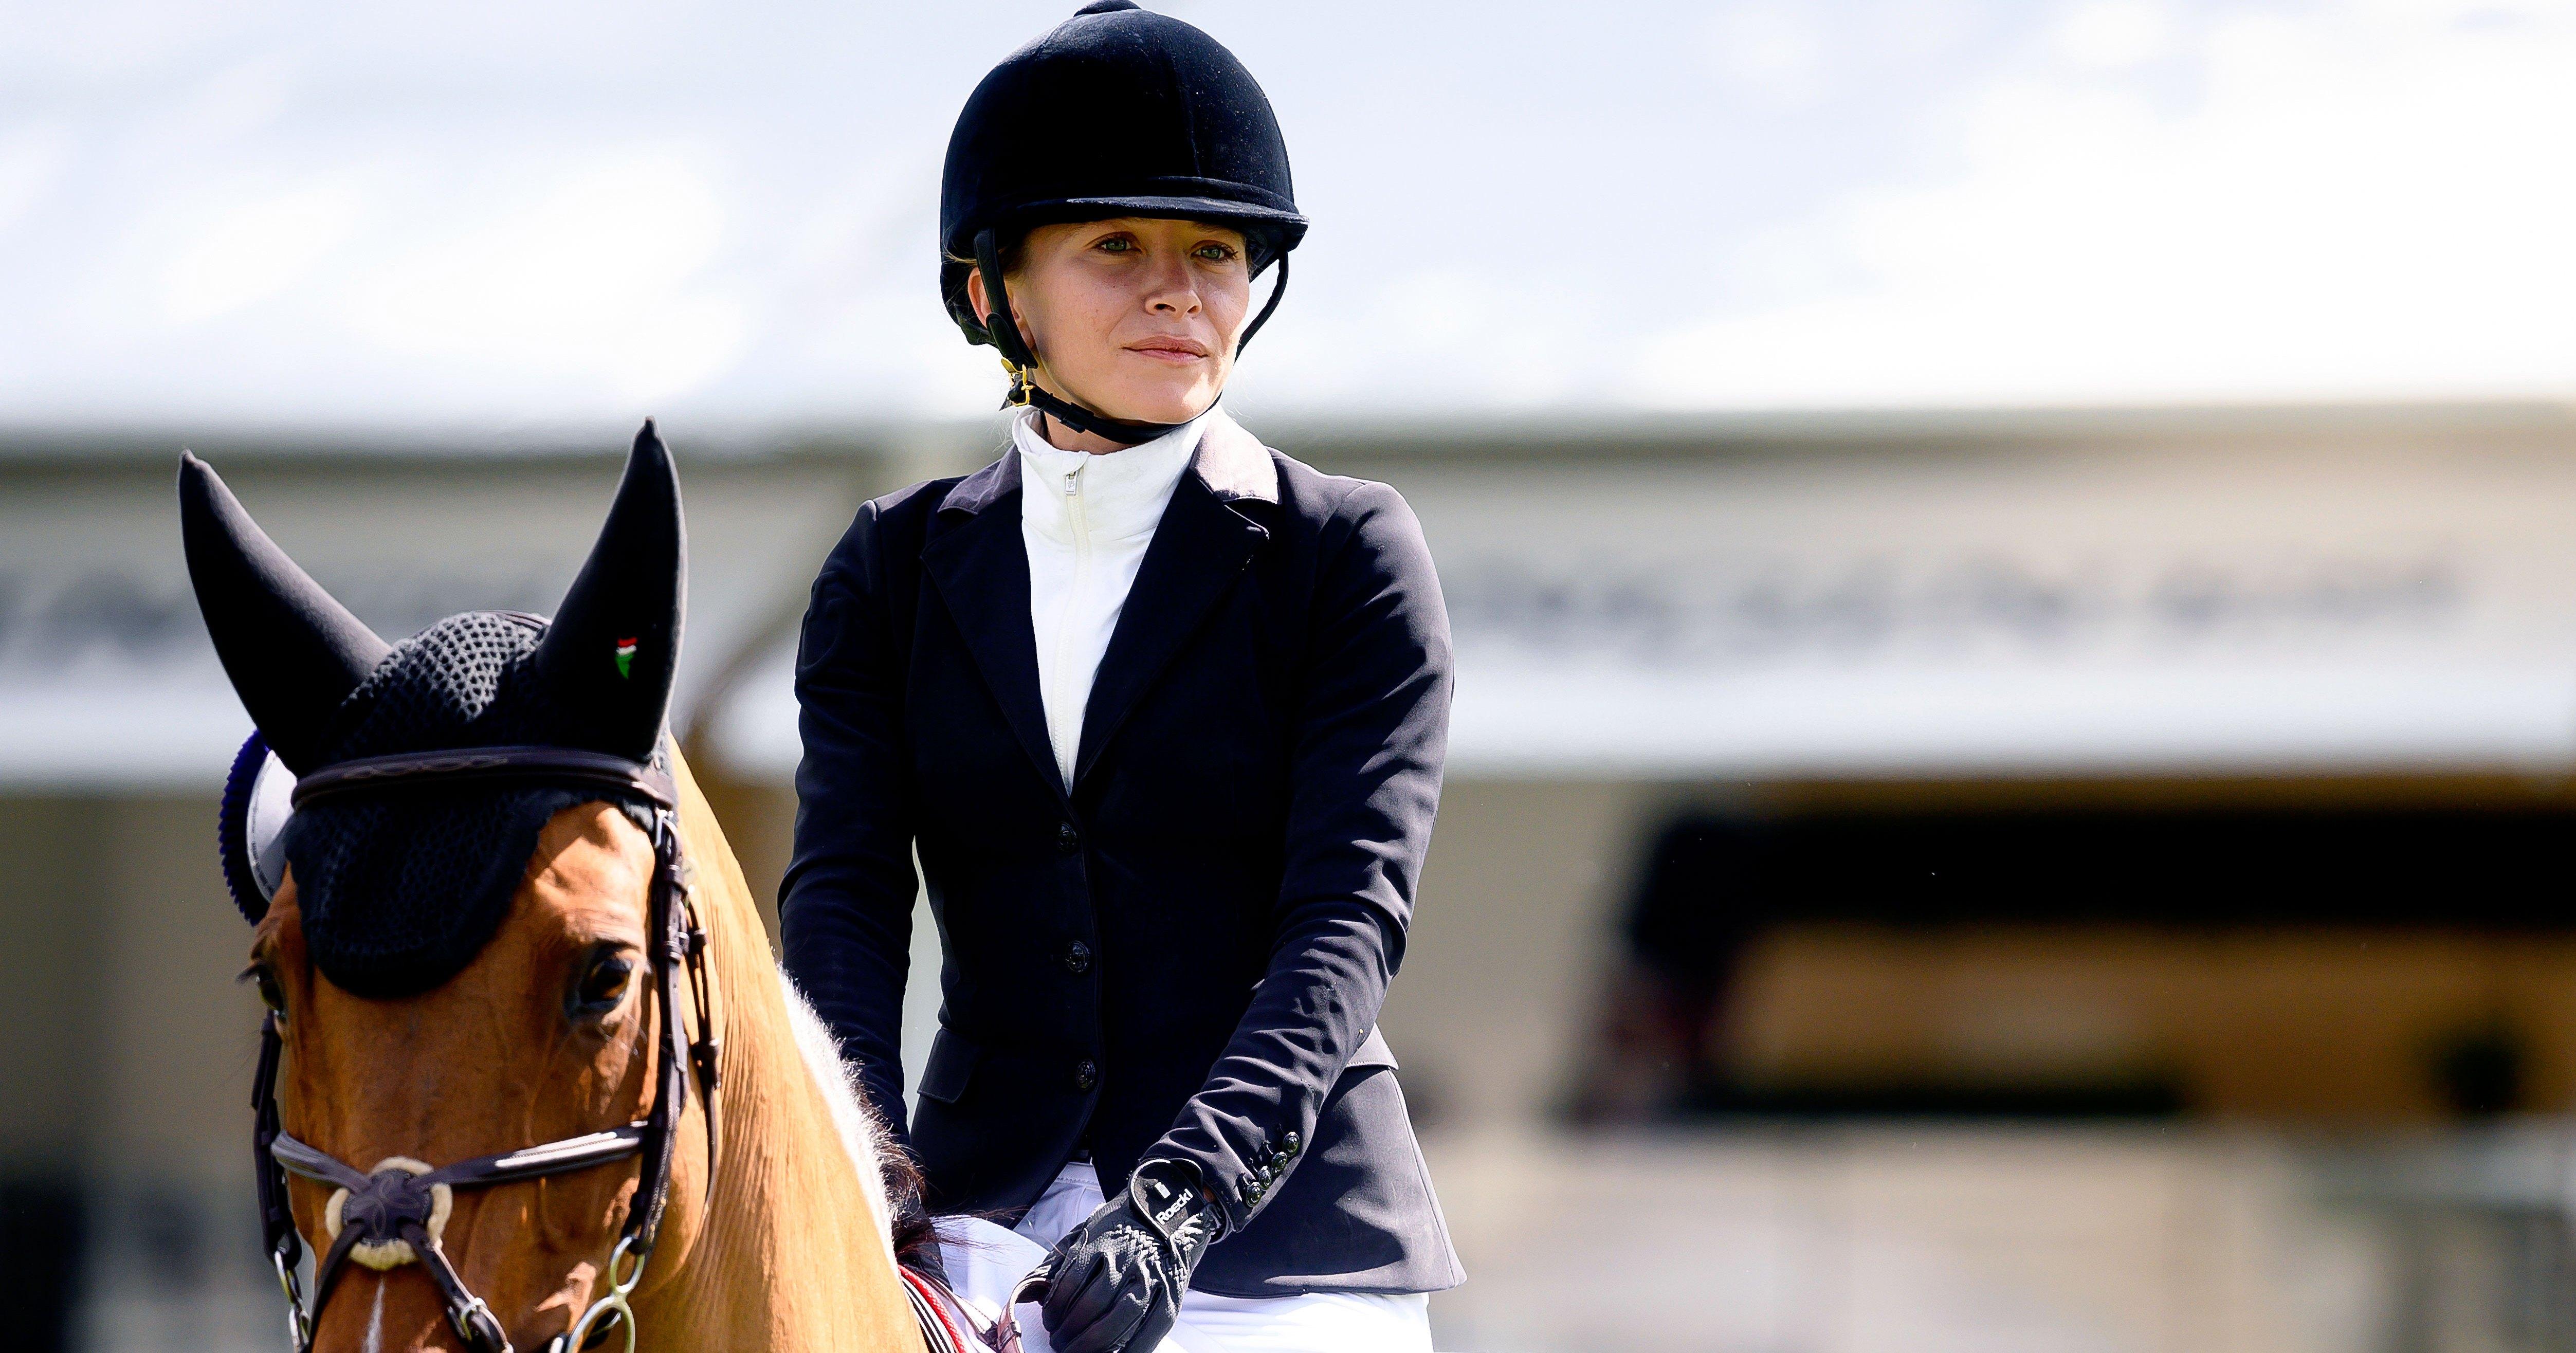 Mary-Kate Olsen Kisses Husband Olivier Sarkozy at Madrid Horseback Riding Event: Photos